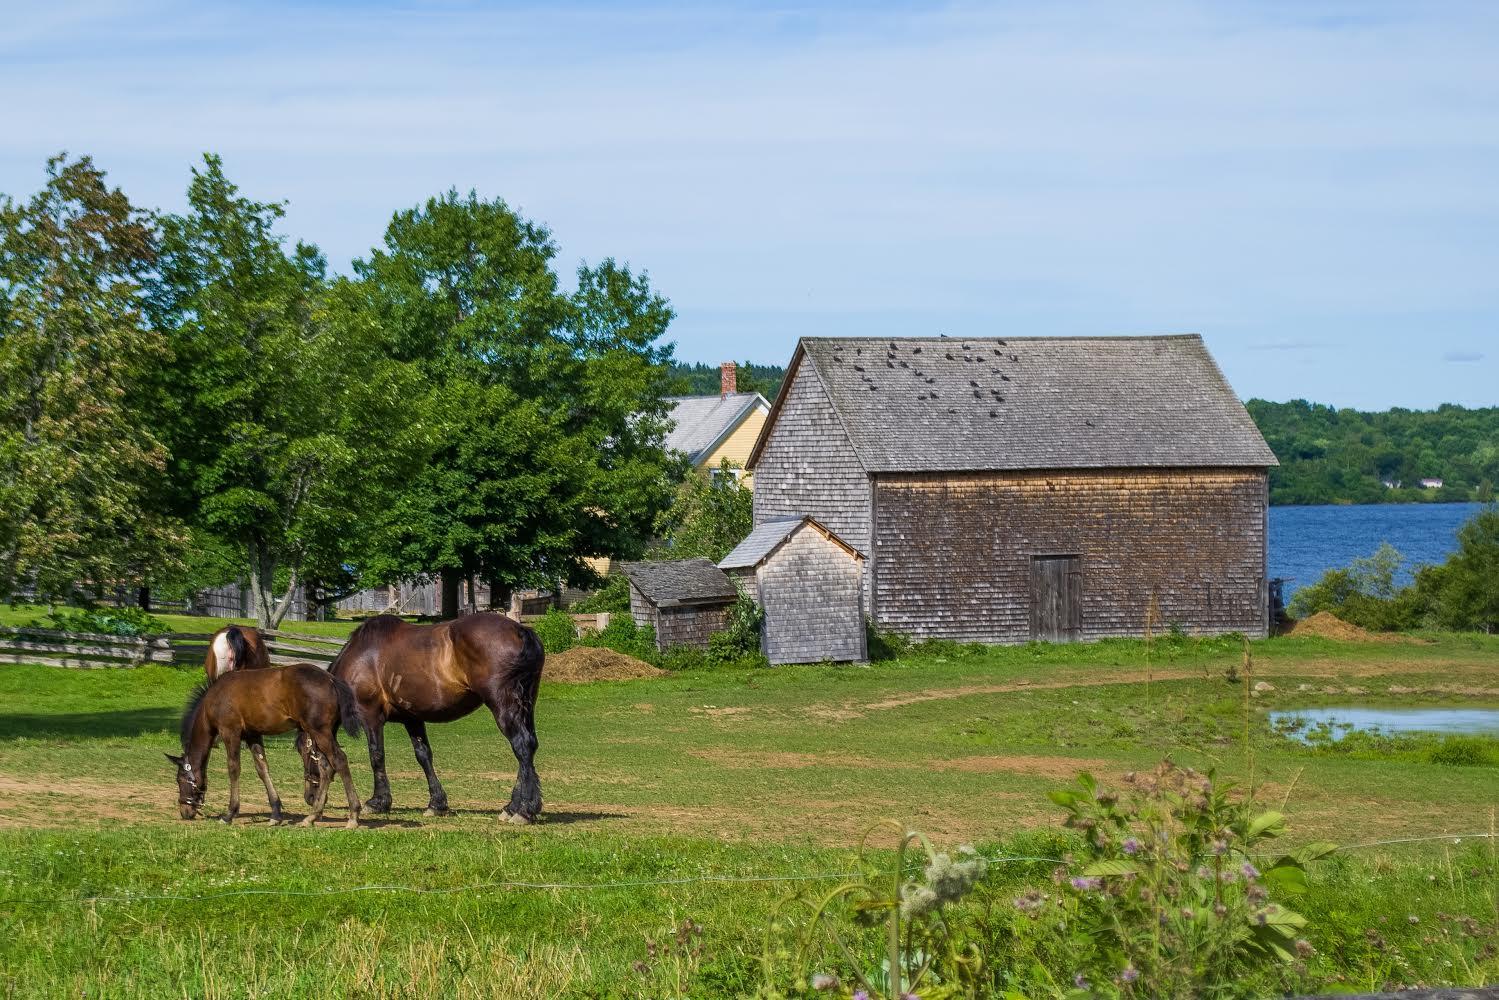 horses-in-field2.jpg